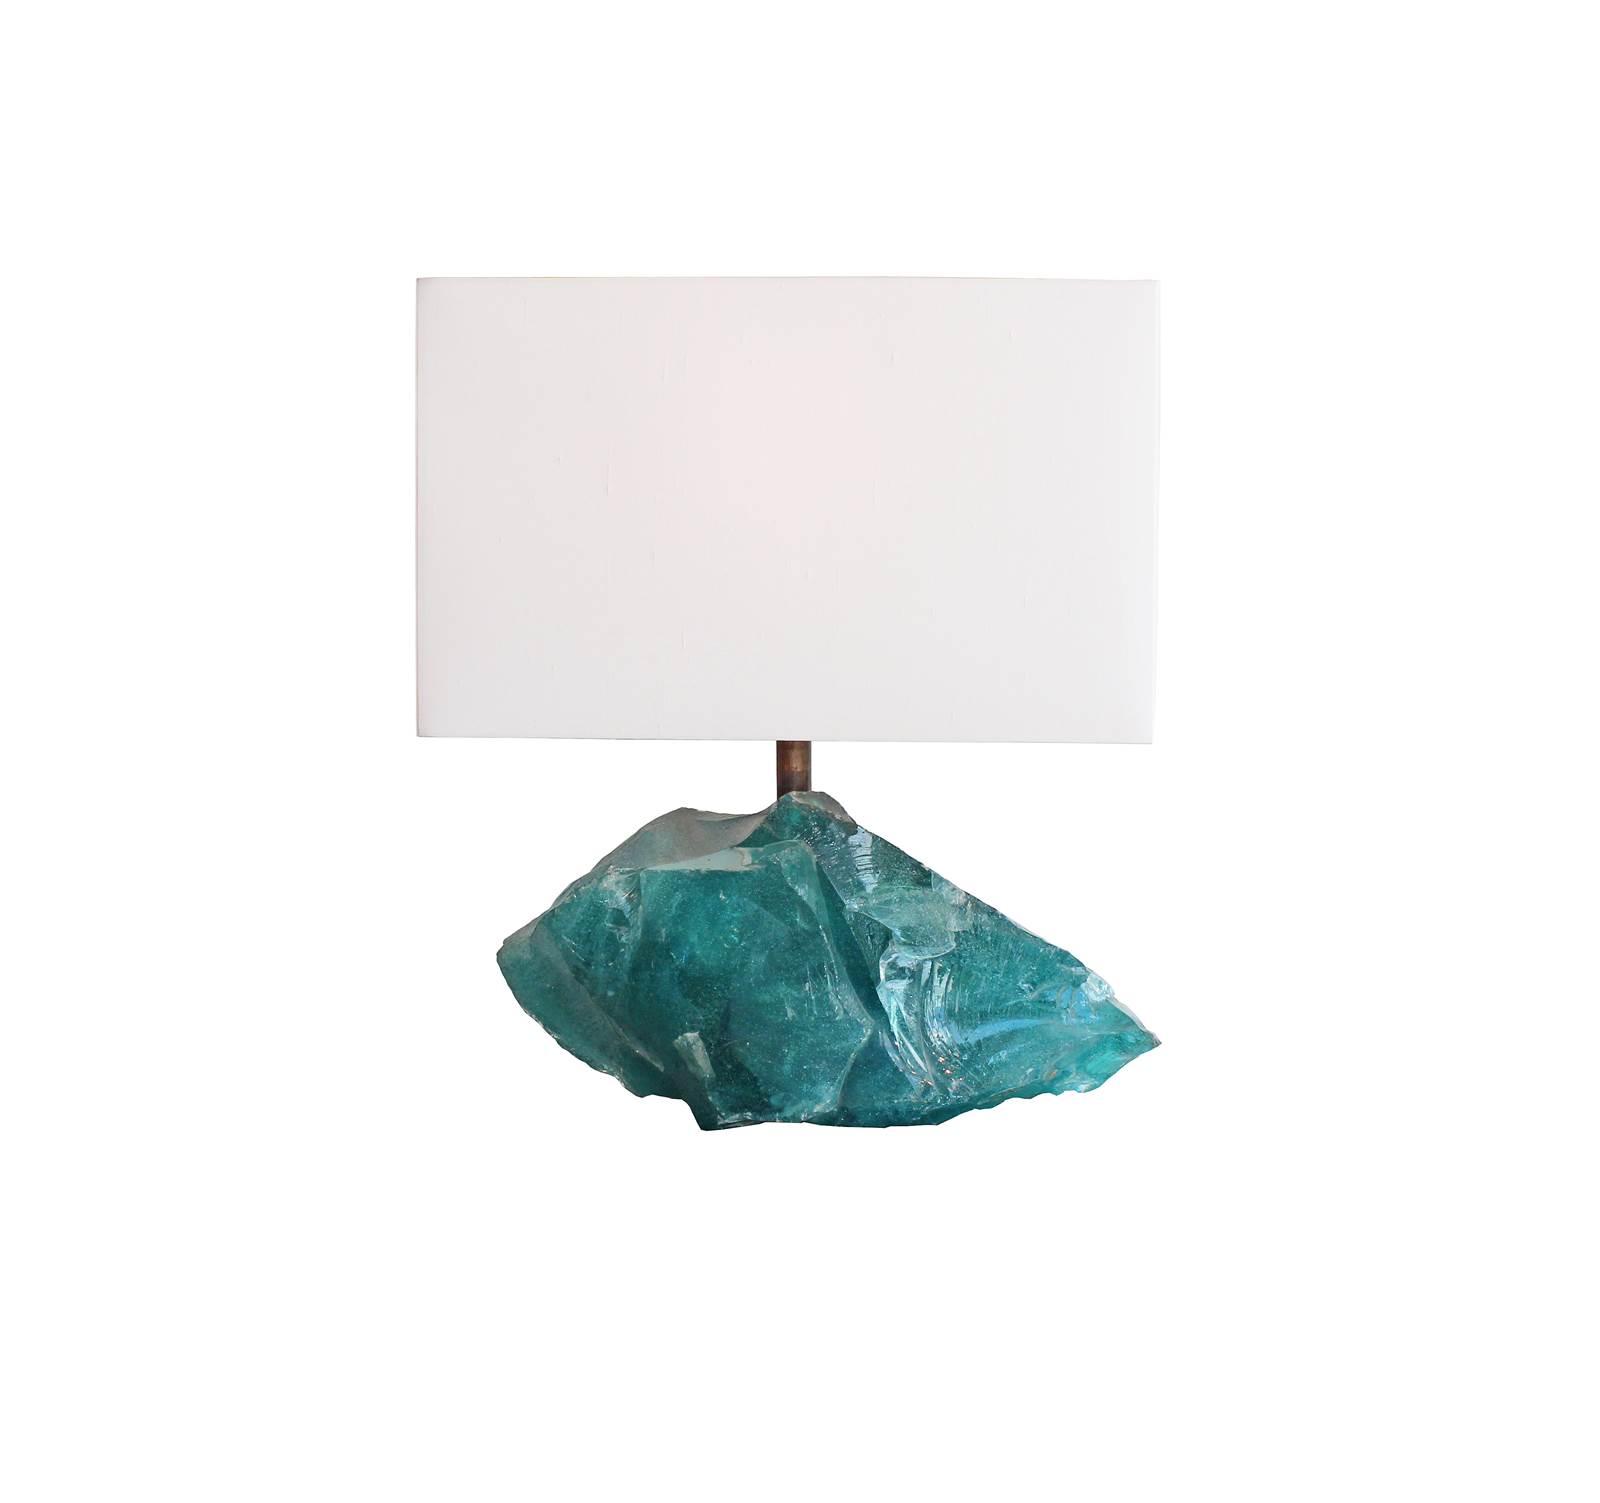 Italian glass rock table lamp glass rock table lamp next italian school glass rock table lamp mozeypictures Gallery